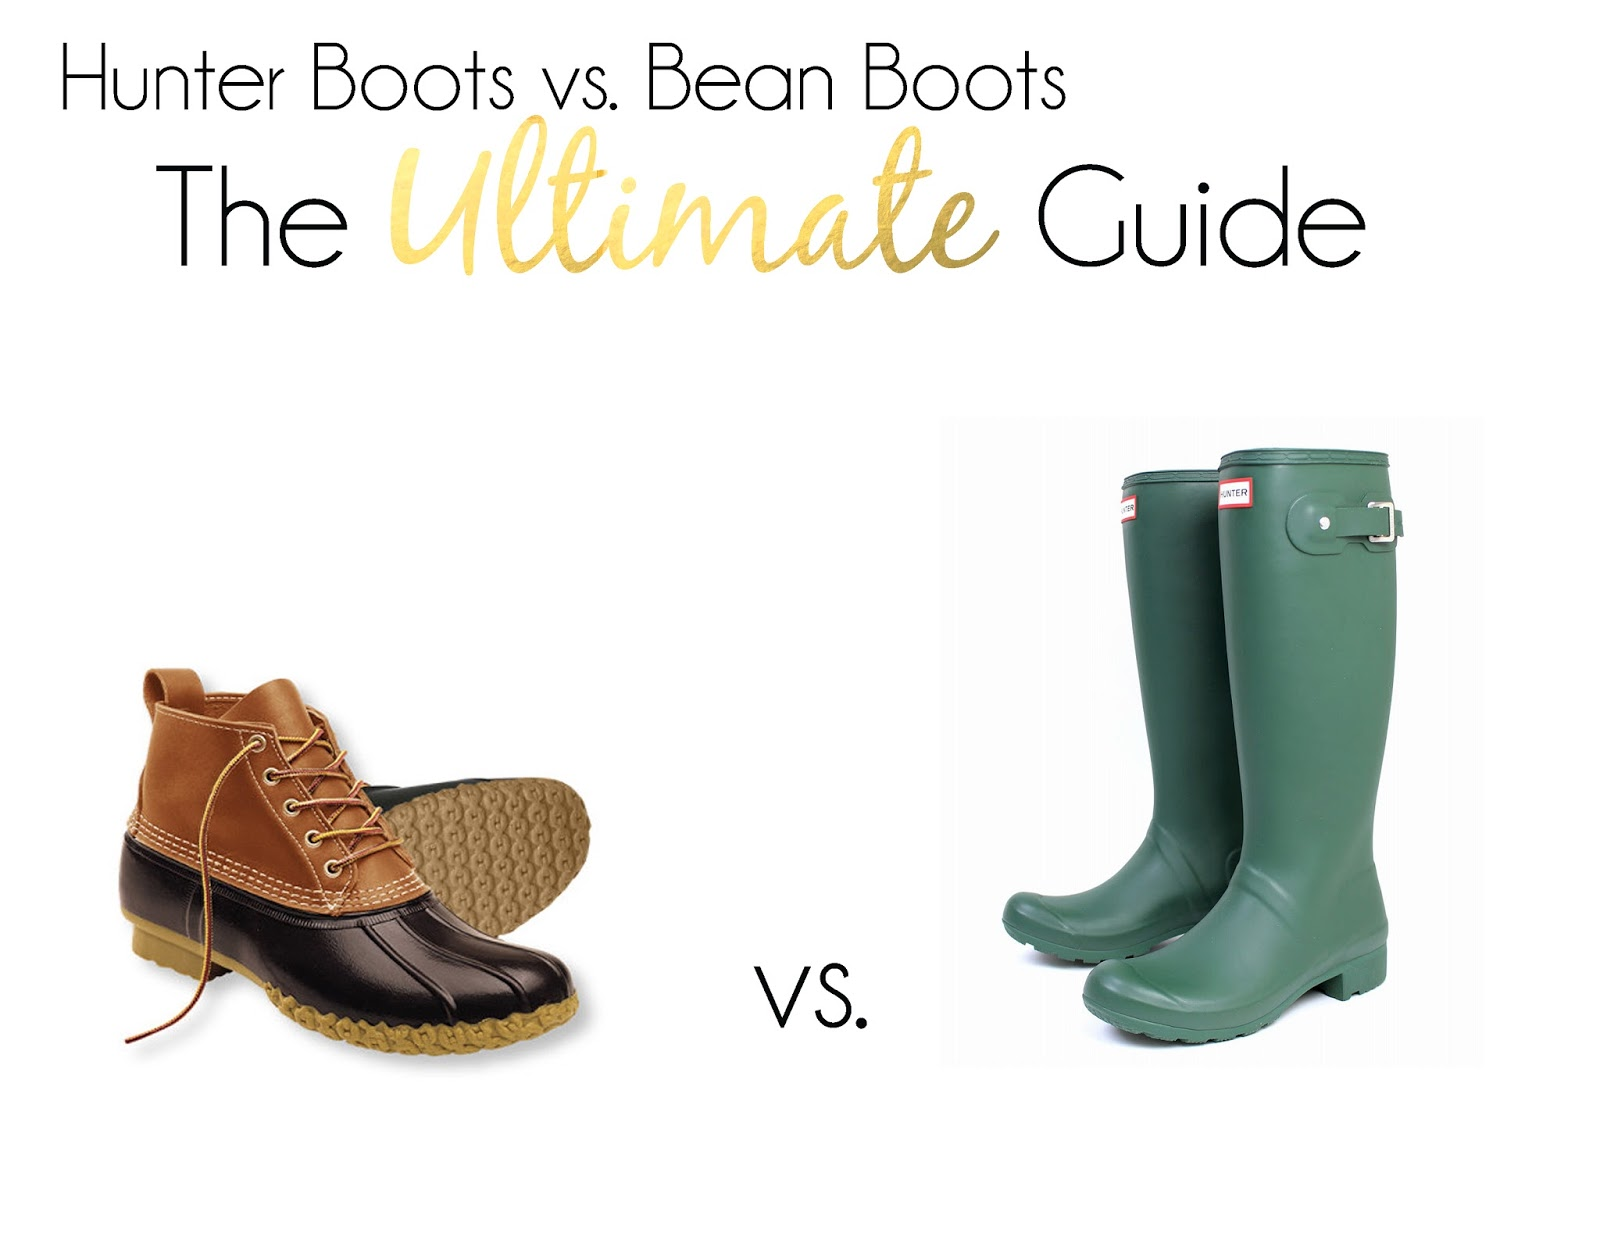 0910b1338c0 L.L. Bean Boots vs. Hunter Boots: The Ultimate Guide - PrepEssentials